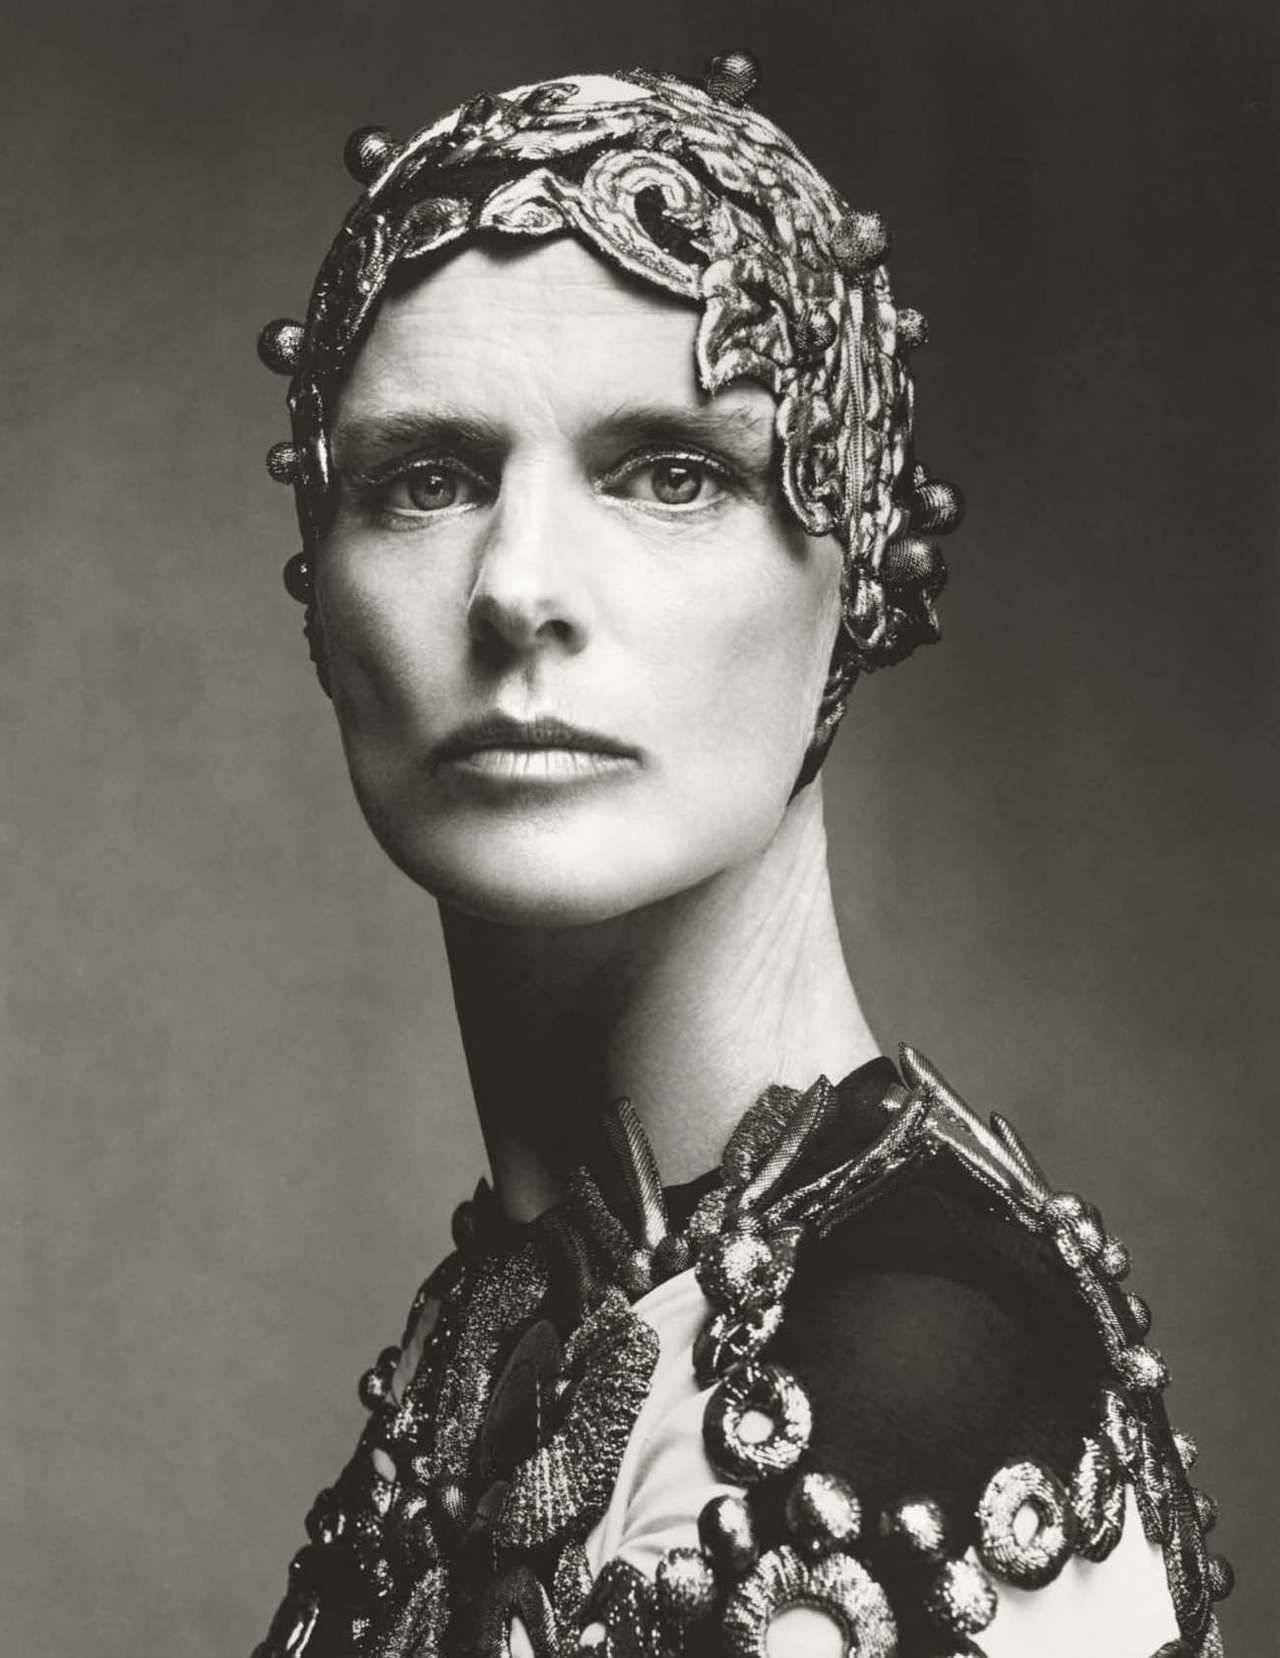 Stella Tennant by Steven Meisel for Vogue UK Dec 2018 (7).jpg